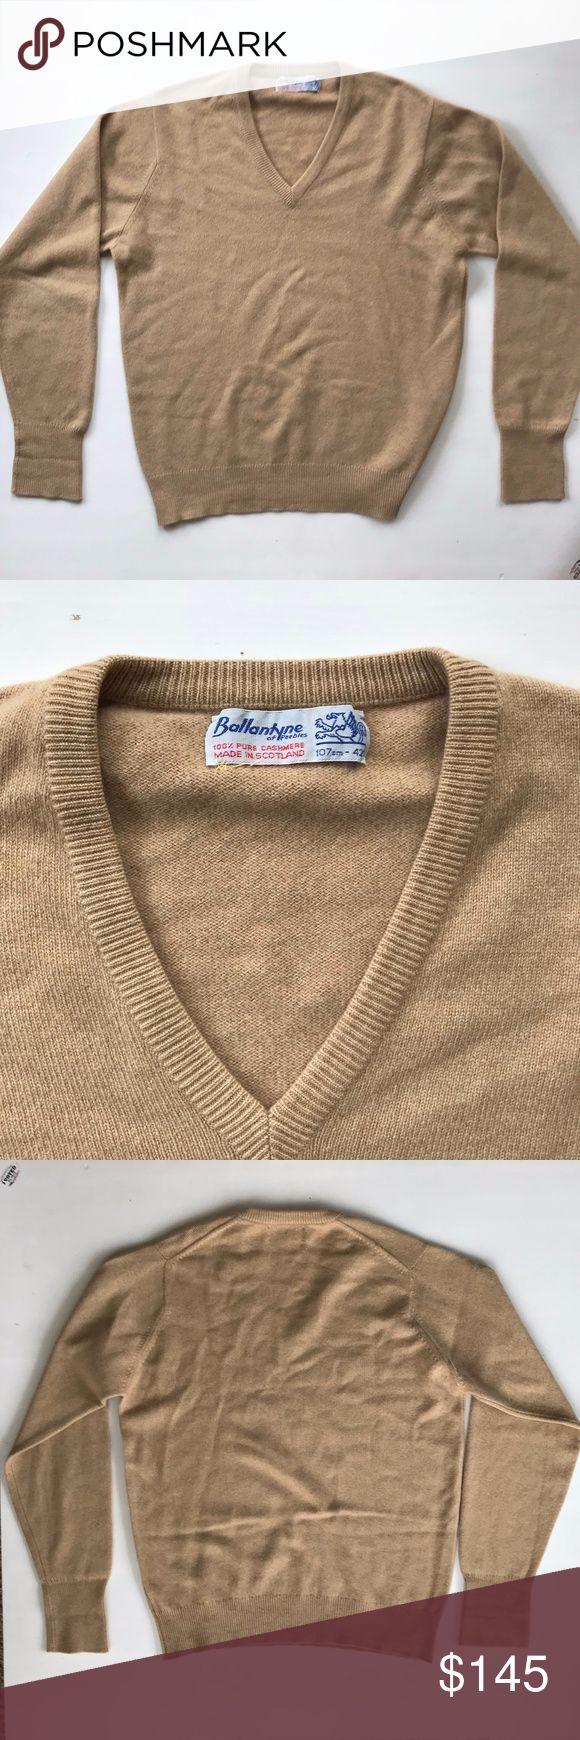 Men's 100% Cashmere Sweater - Ballantyne - Men's 100% Brown / Tan Pure Cashmere V-neck Sweater from Ballantyne. Made in Scotland. Size: 107cm-42cm Ballantyne Sweaters V-Neck